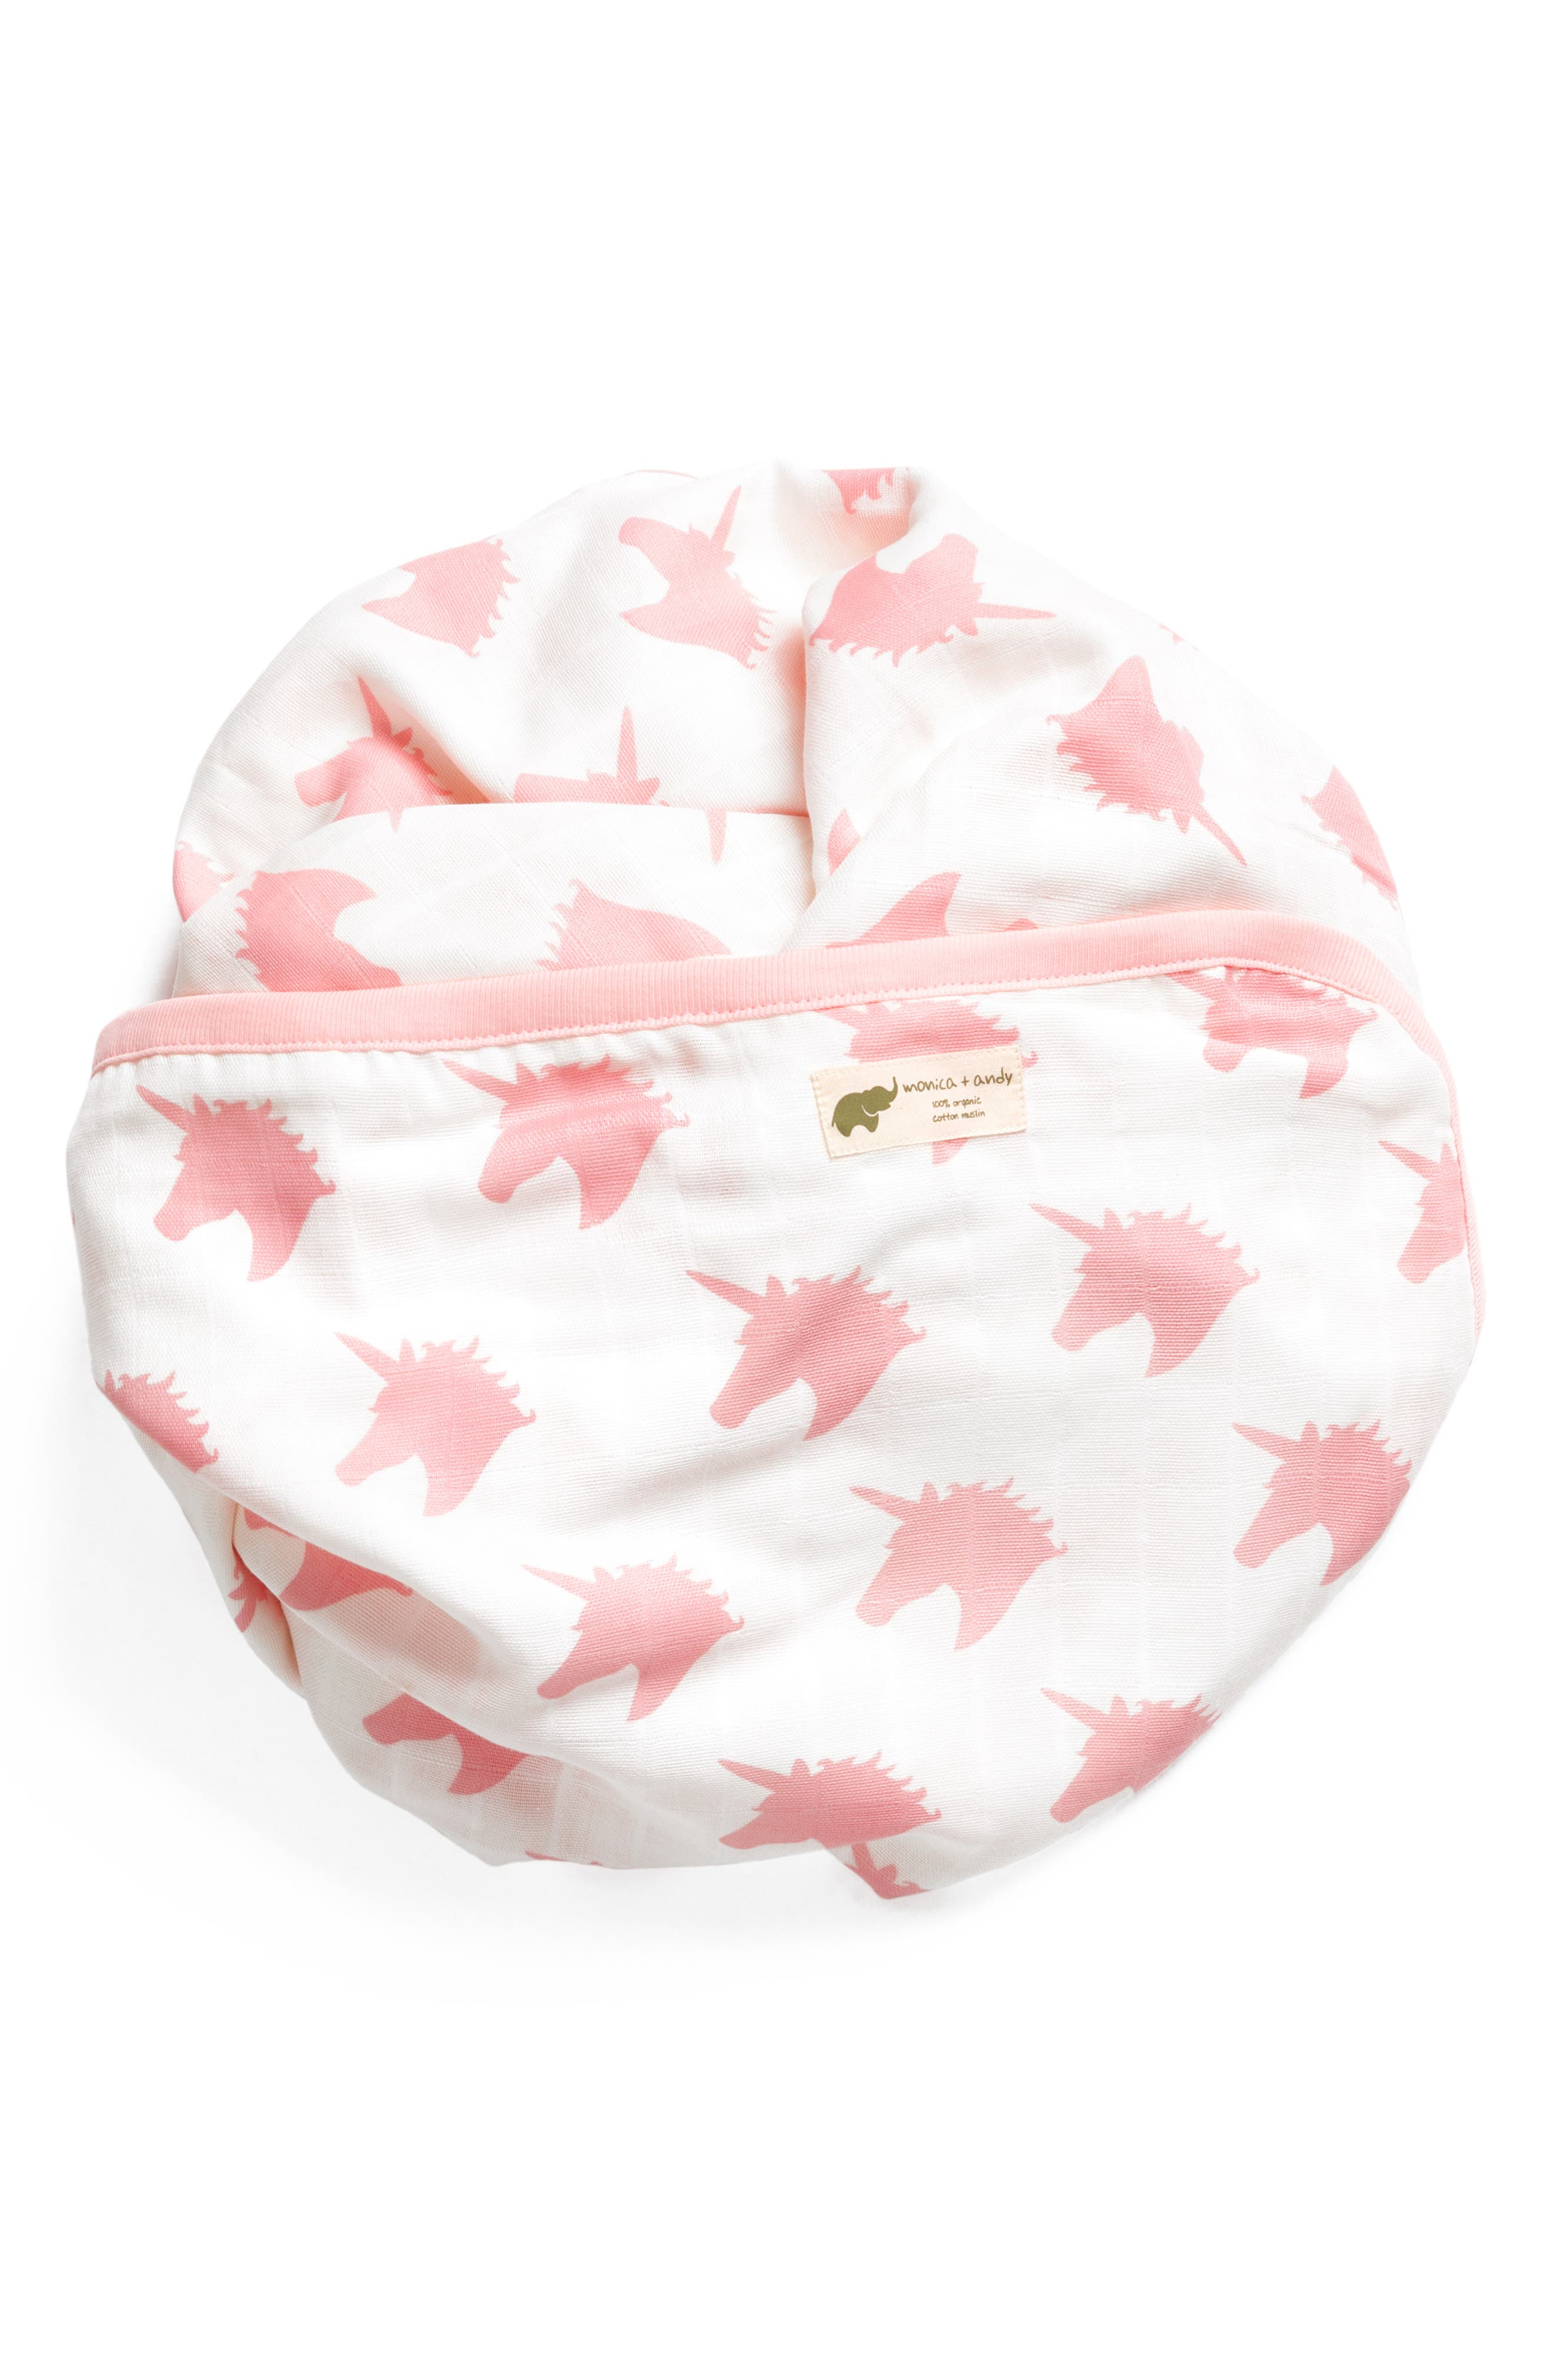 MONICA + ANDY Believe in Unicorns Organic Cotton Always Blanket, Main, color, BELIEVE IN UNICORNS